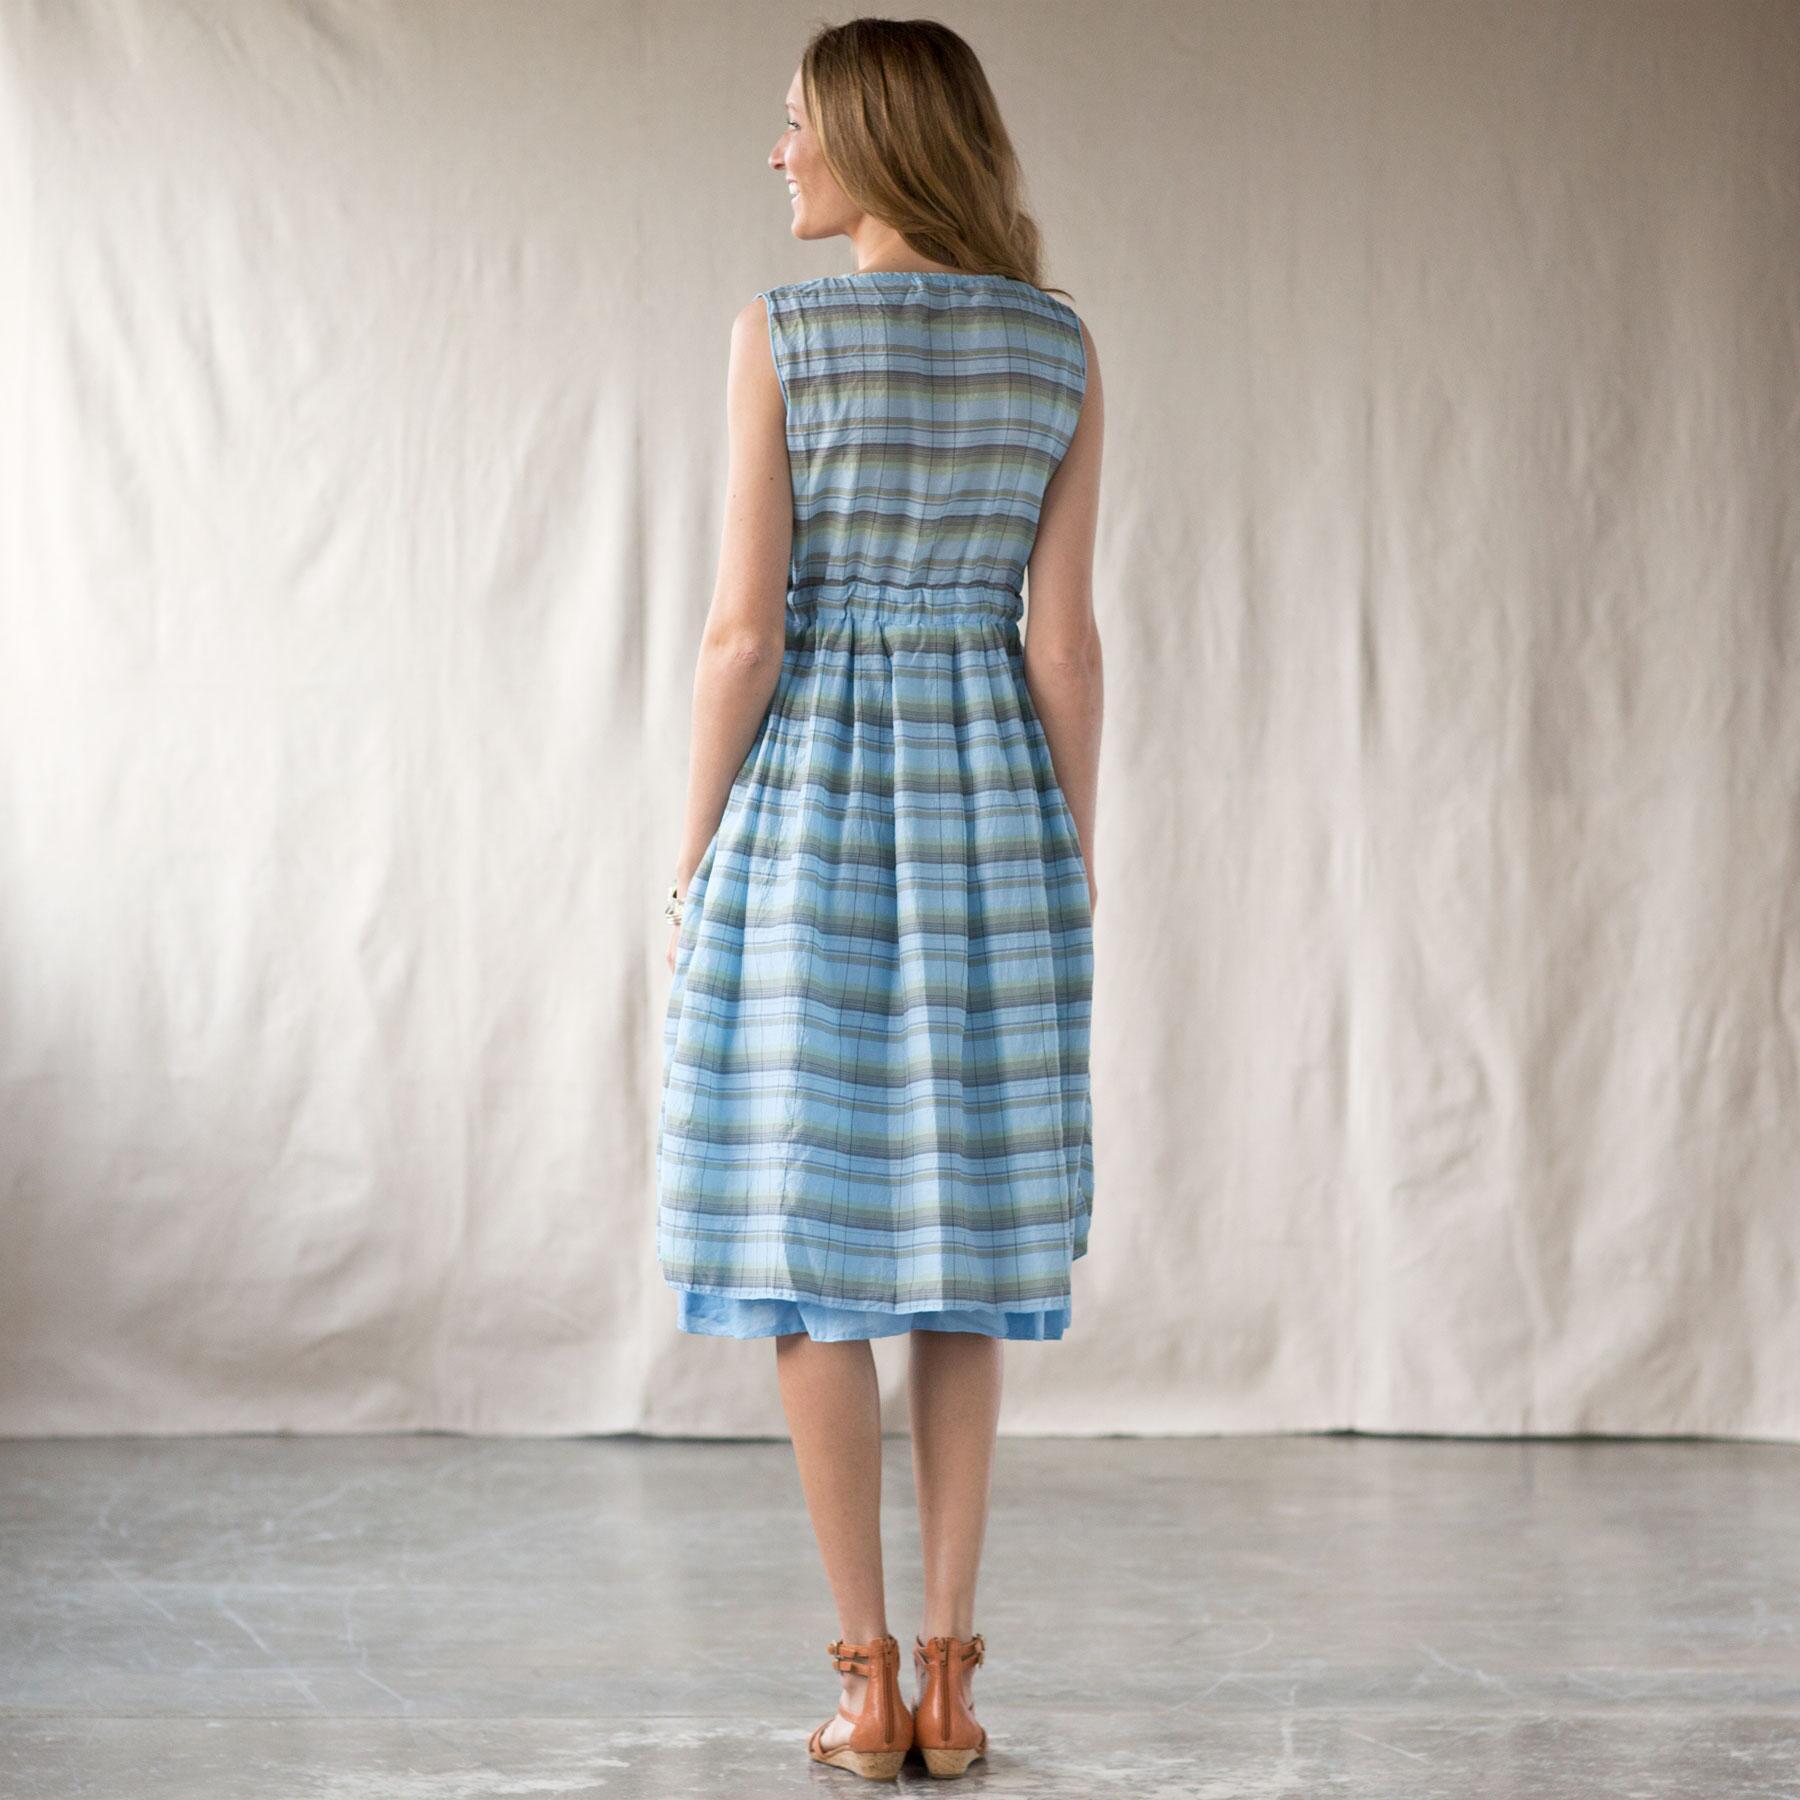 JULIA DRESS OVERDYED PLAID MARINE: View 2